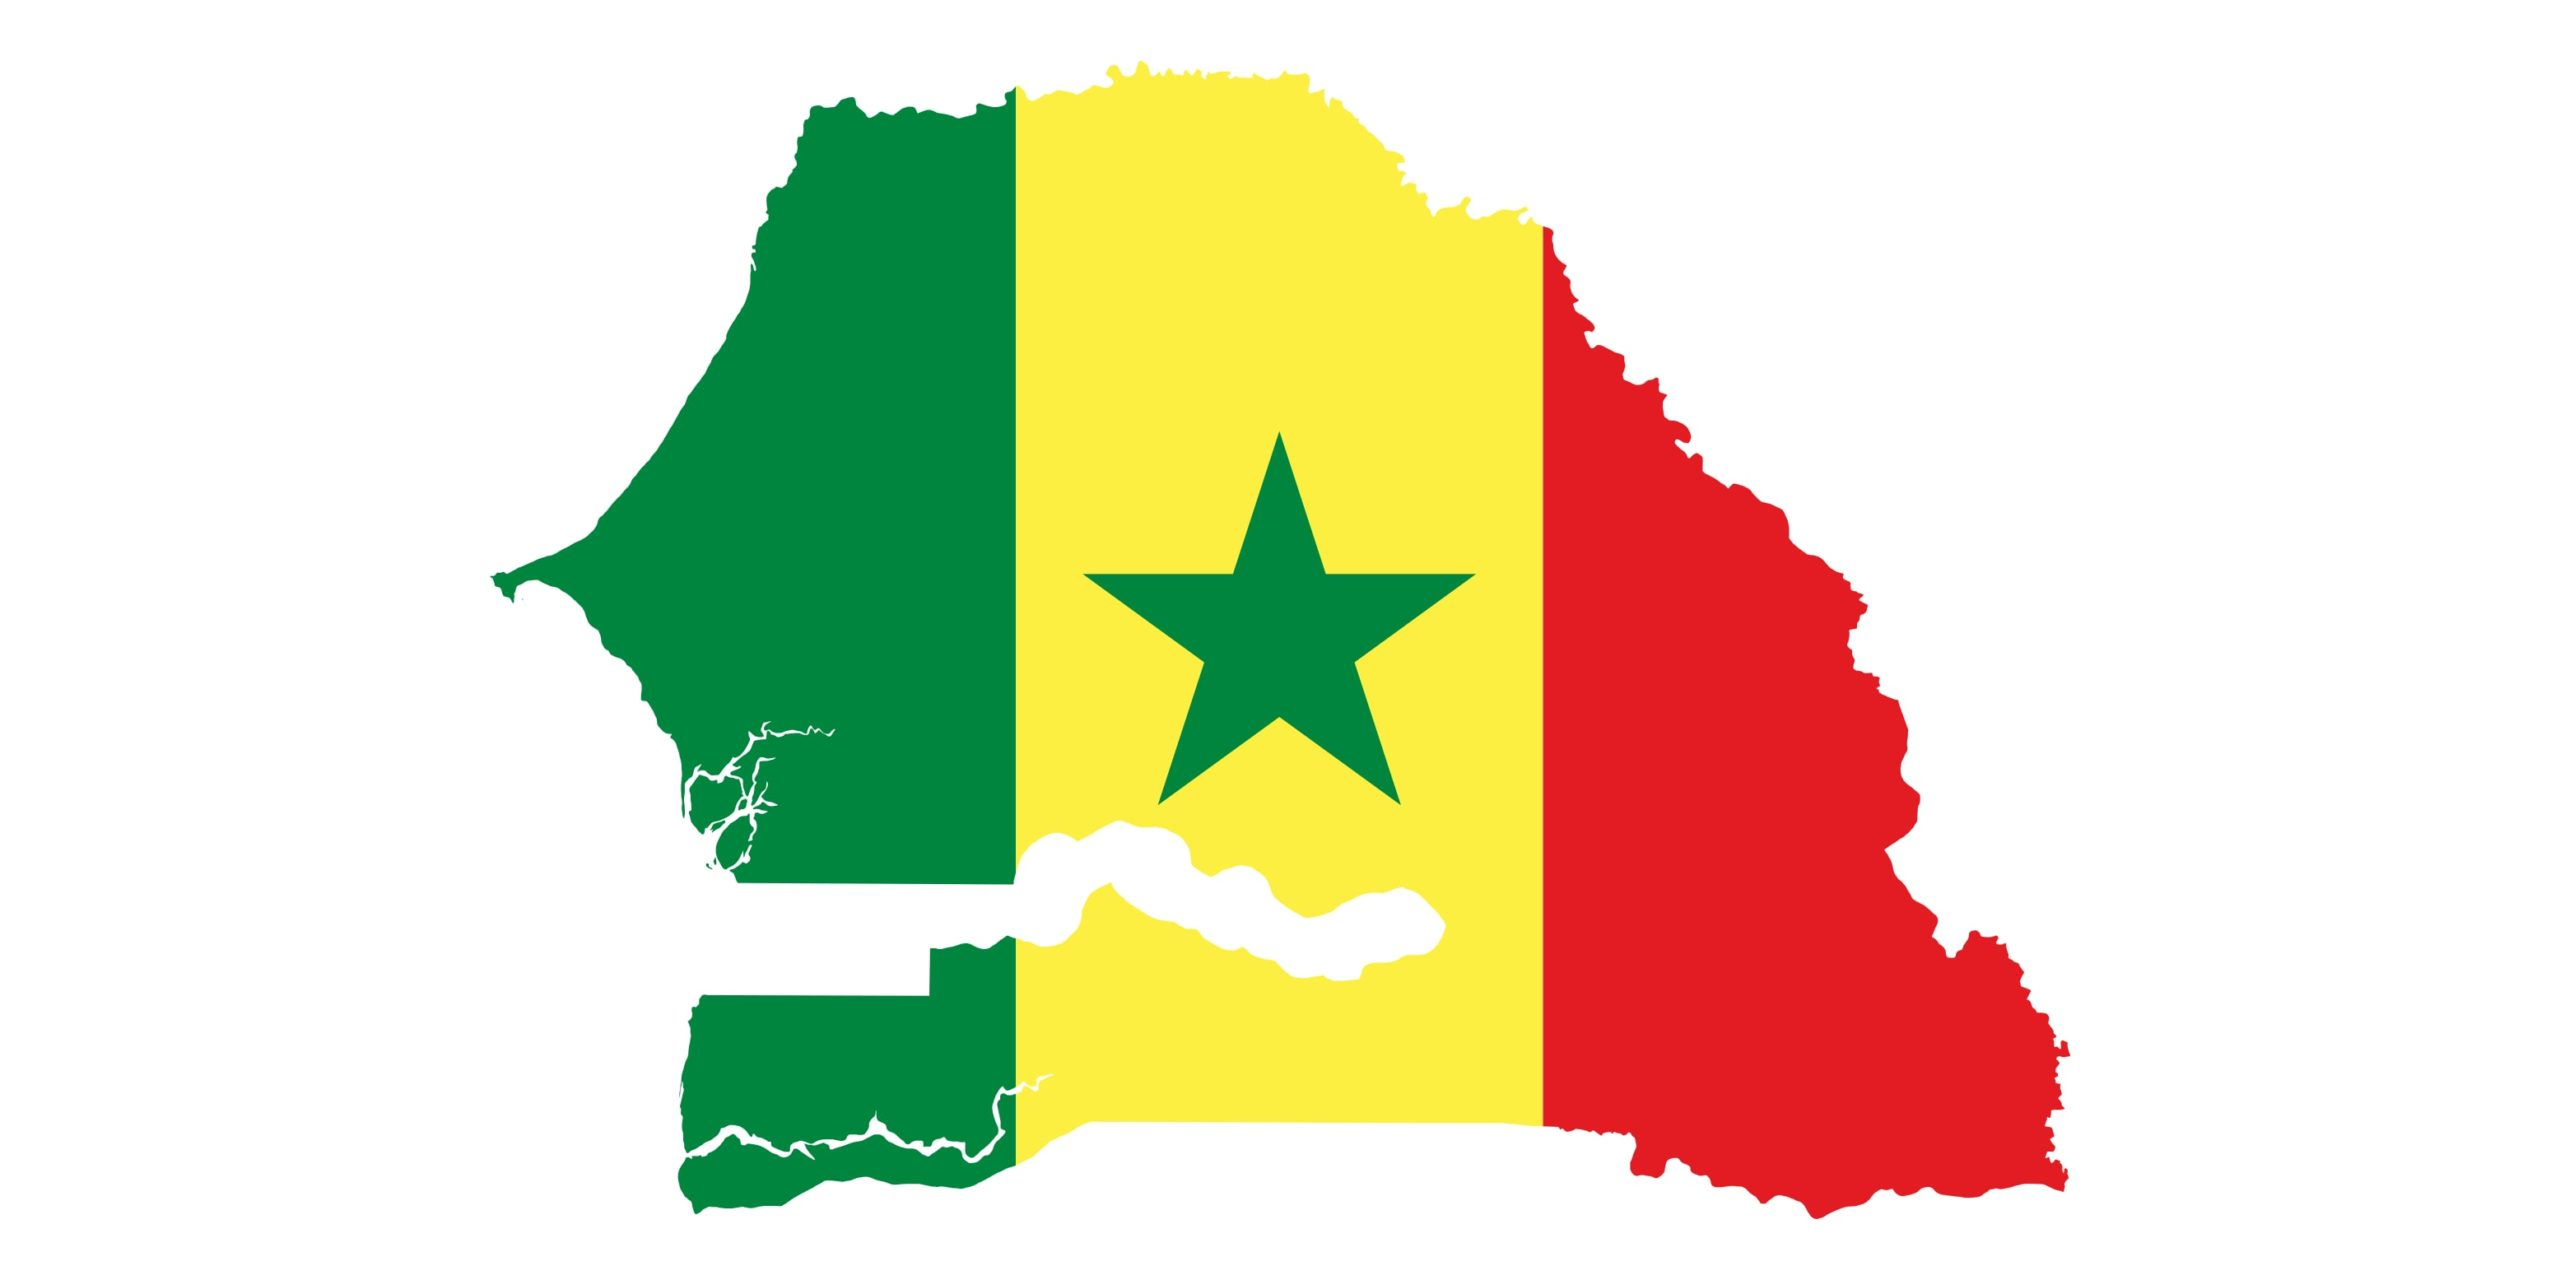 Voyage de bénévolat au Sénégal 2020